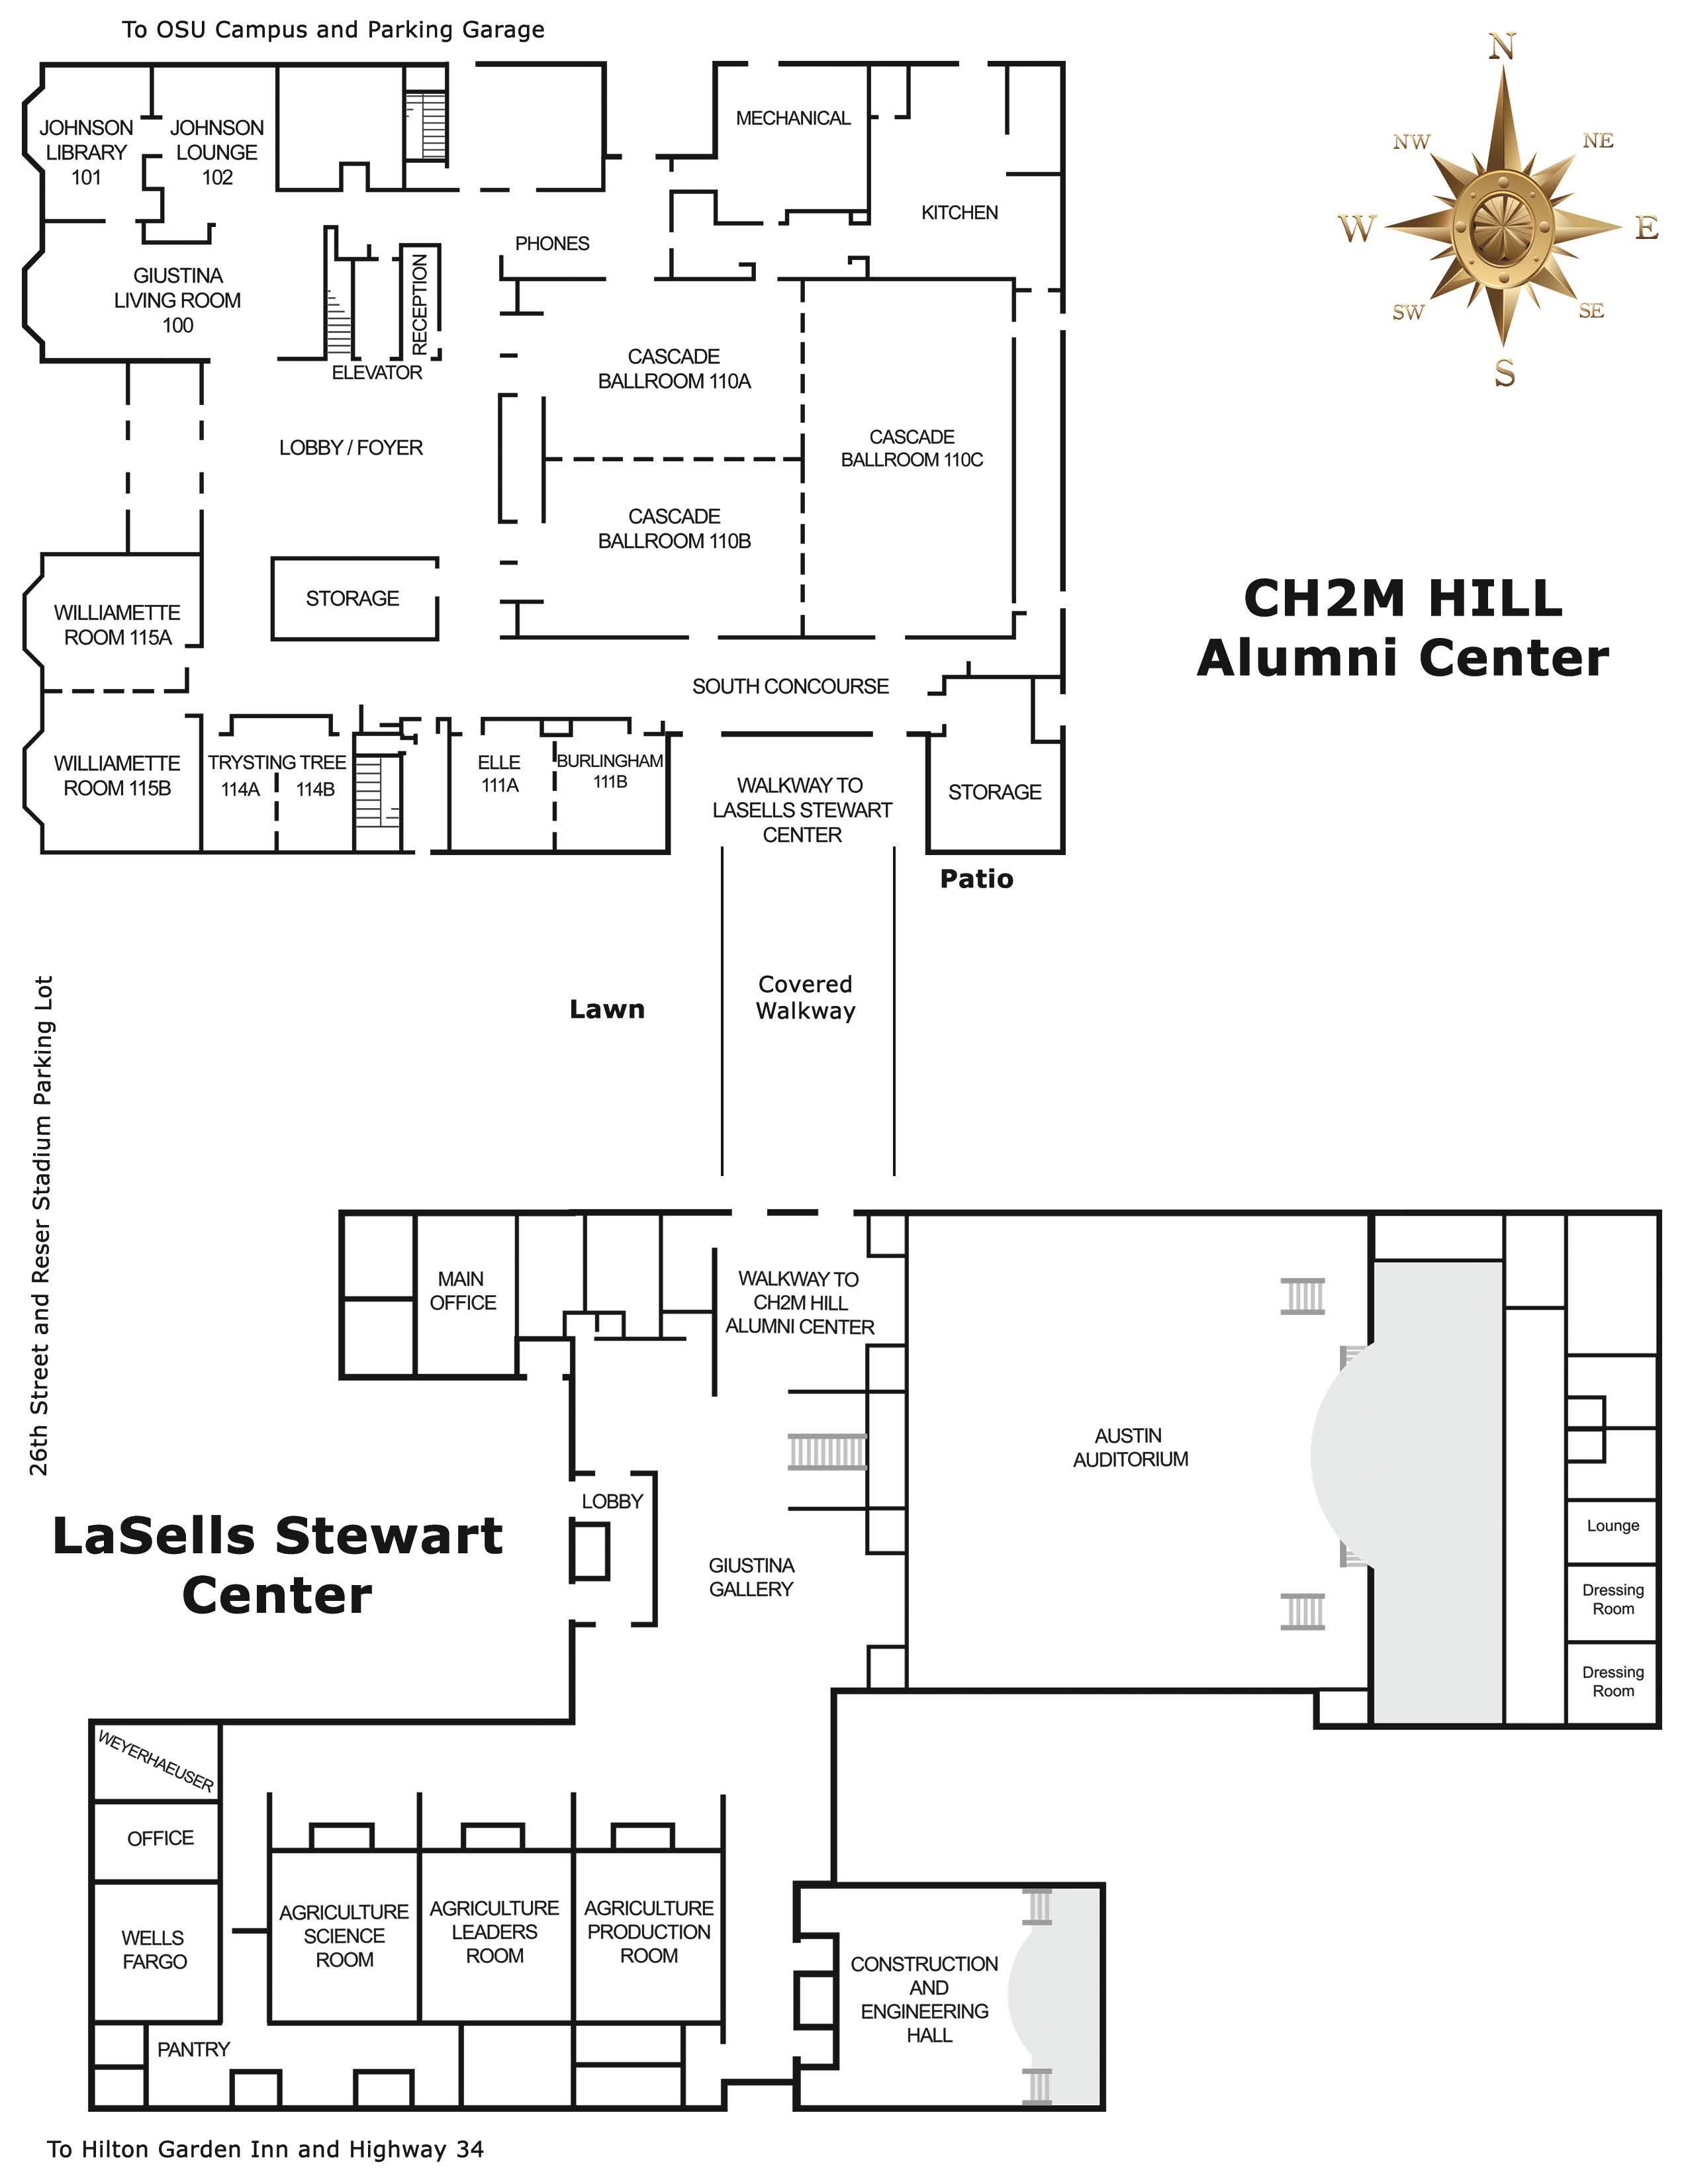 Schematic of The LaSells Stewart Center and Alumni Center